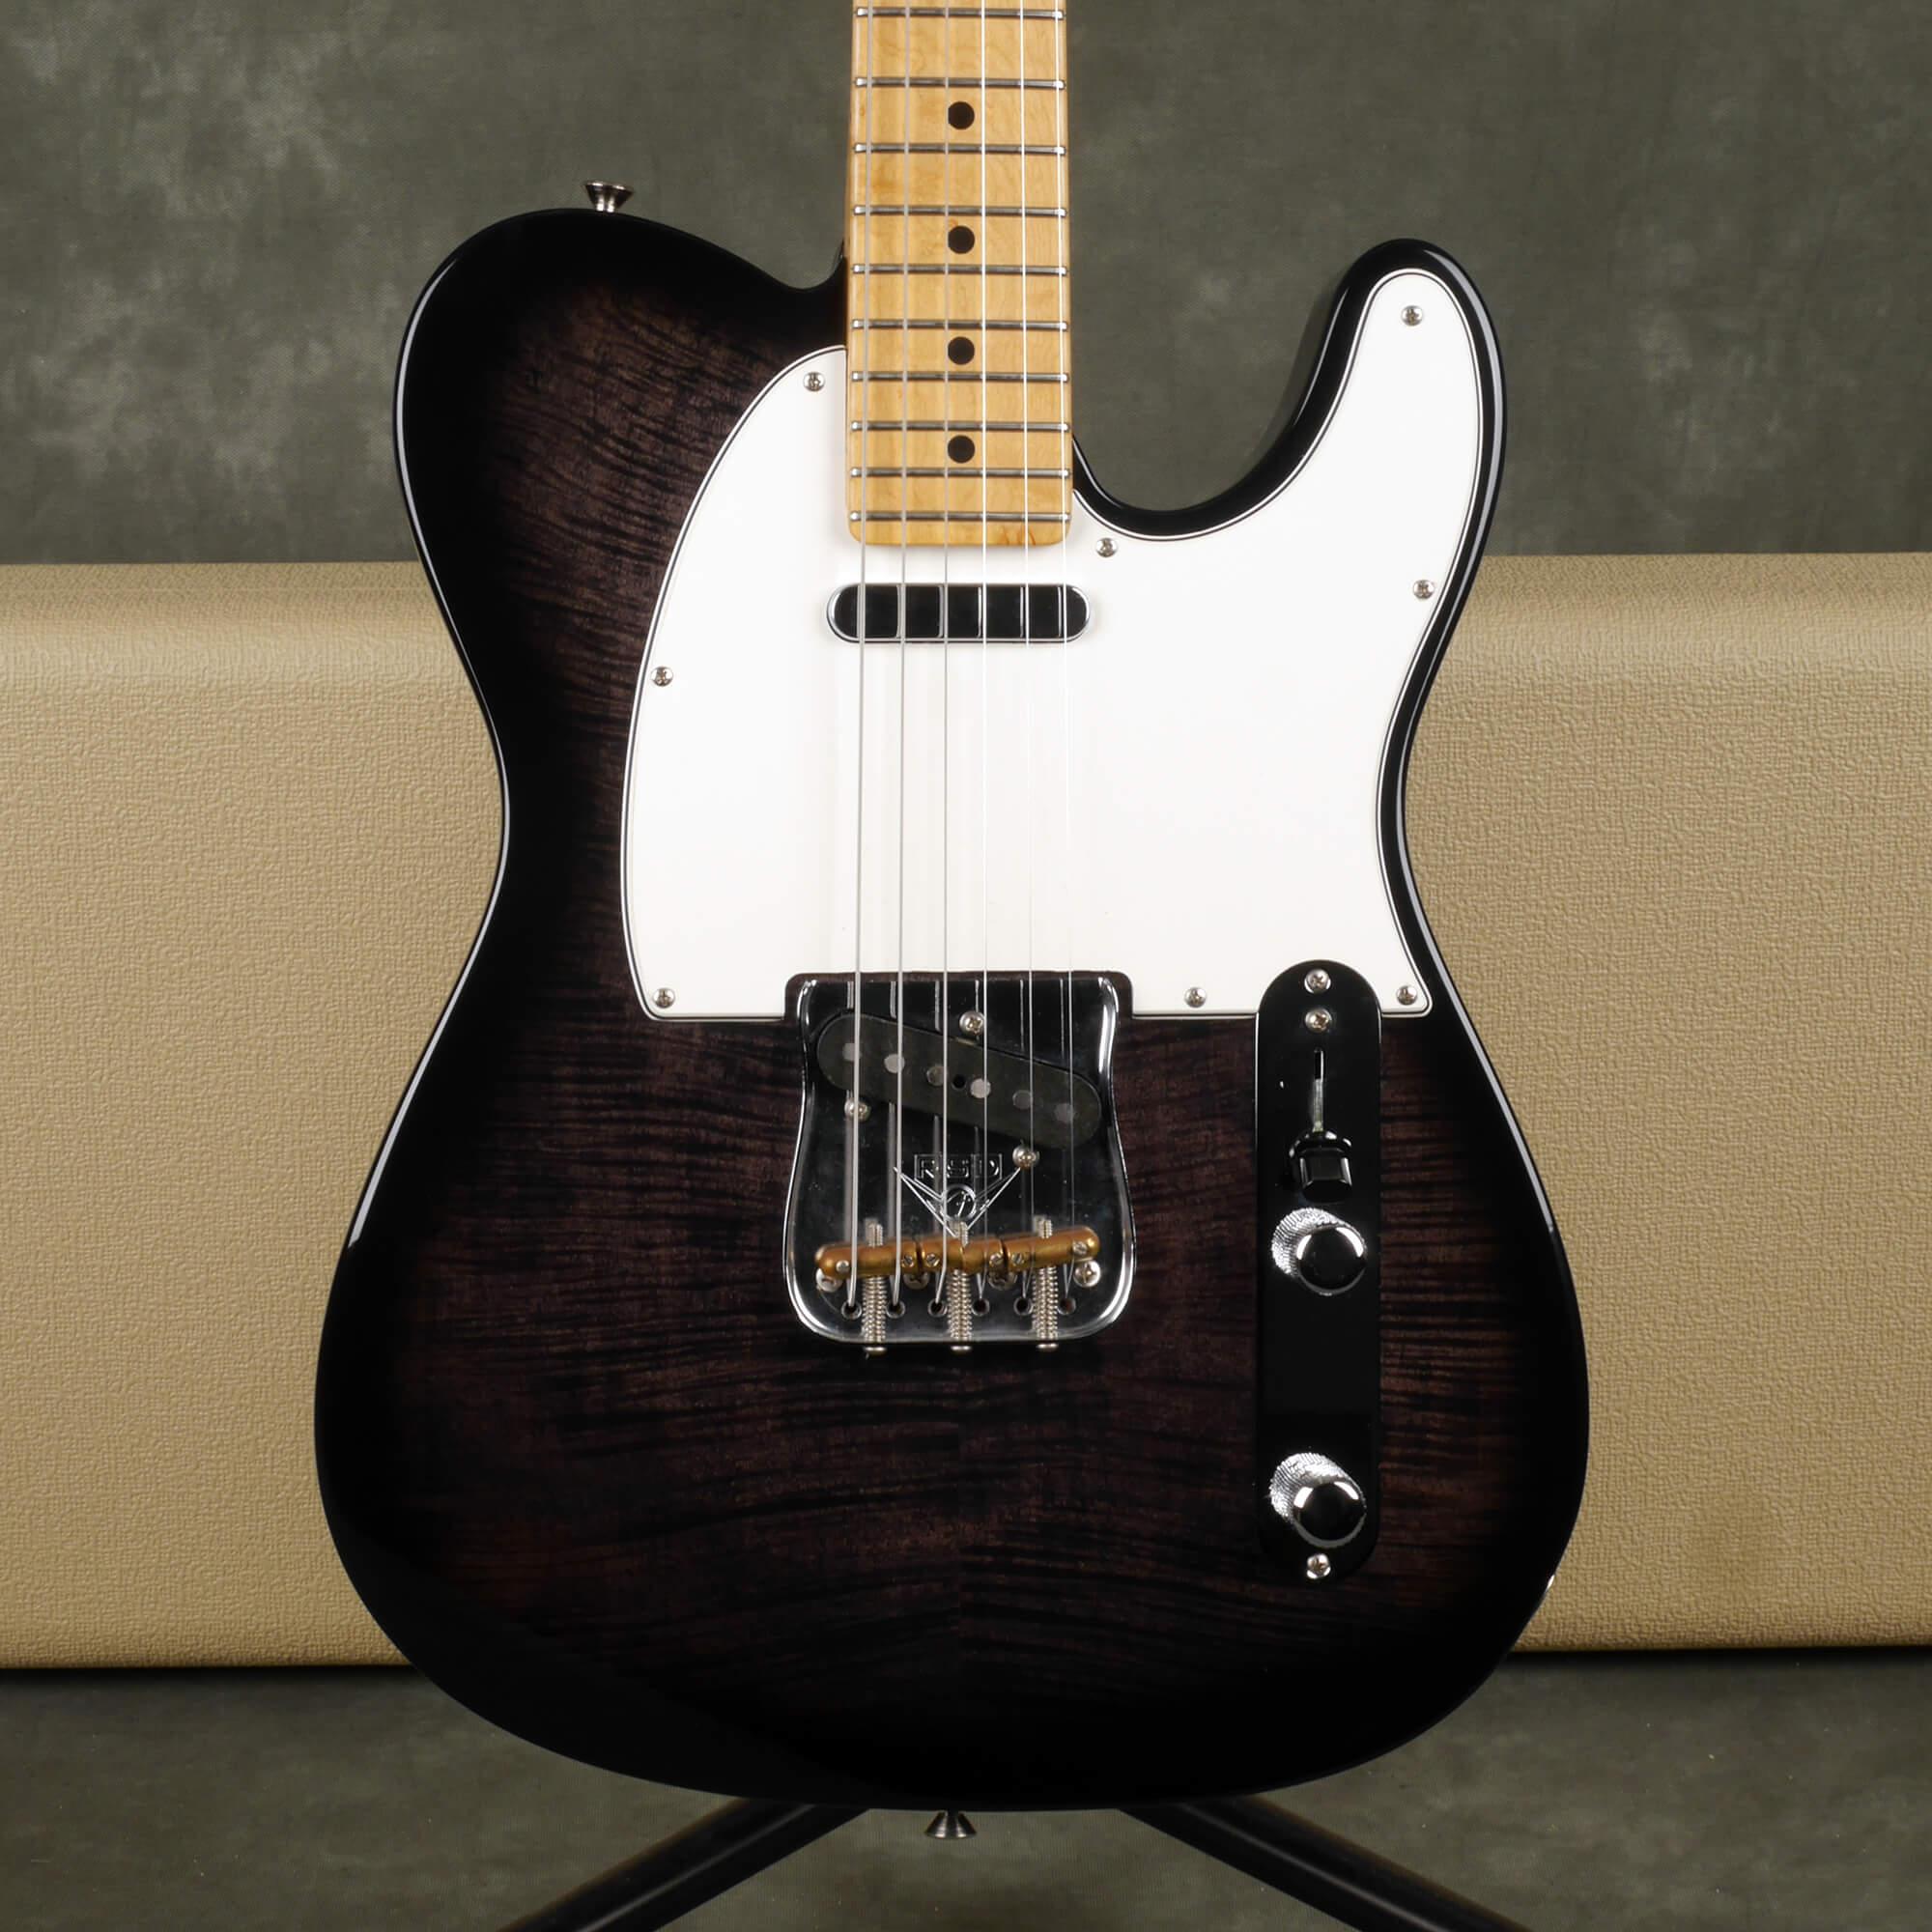 Fender Custom Shop Custom Deluxe Telecaster - Trans Ebony w/Hard Case - 2nd Hand